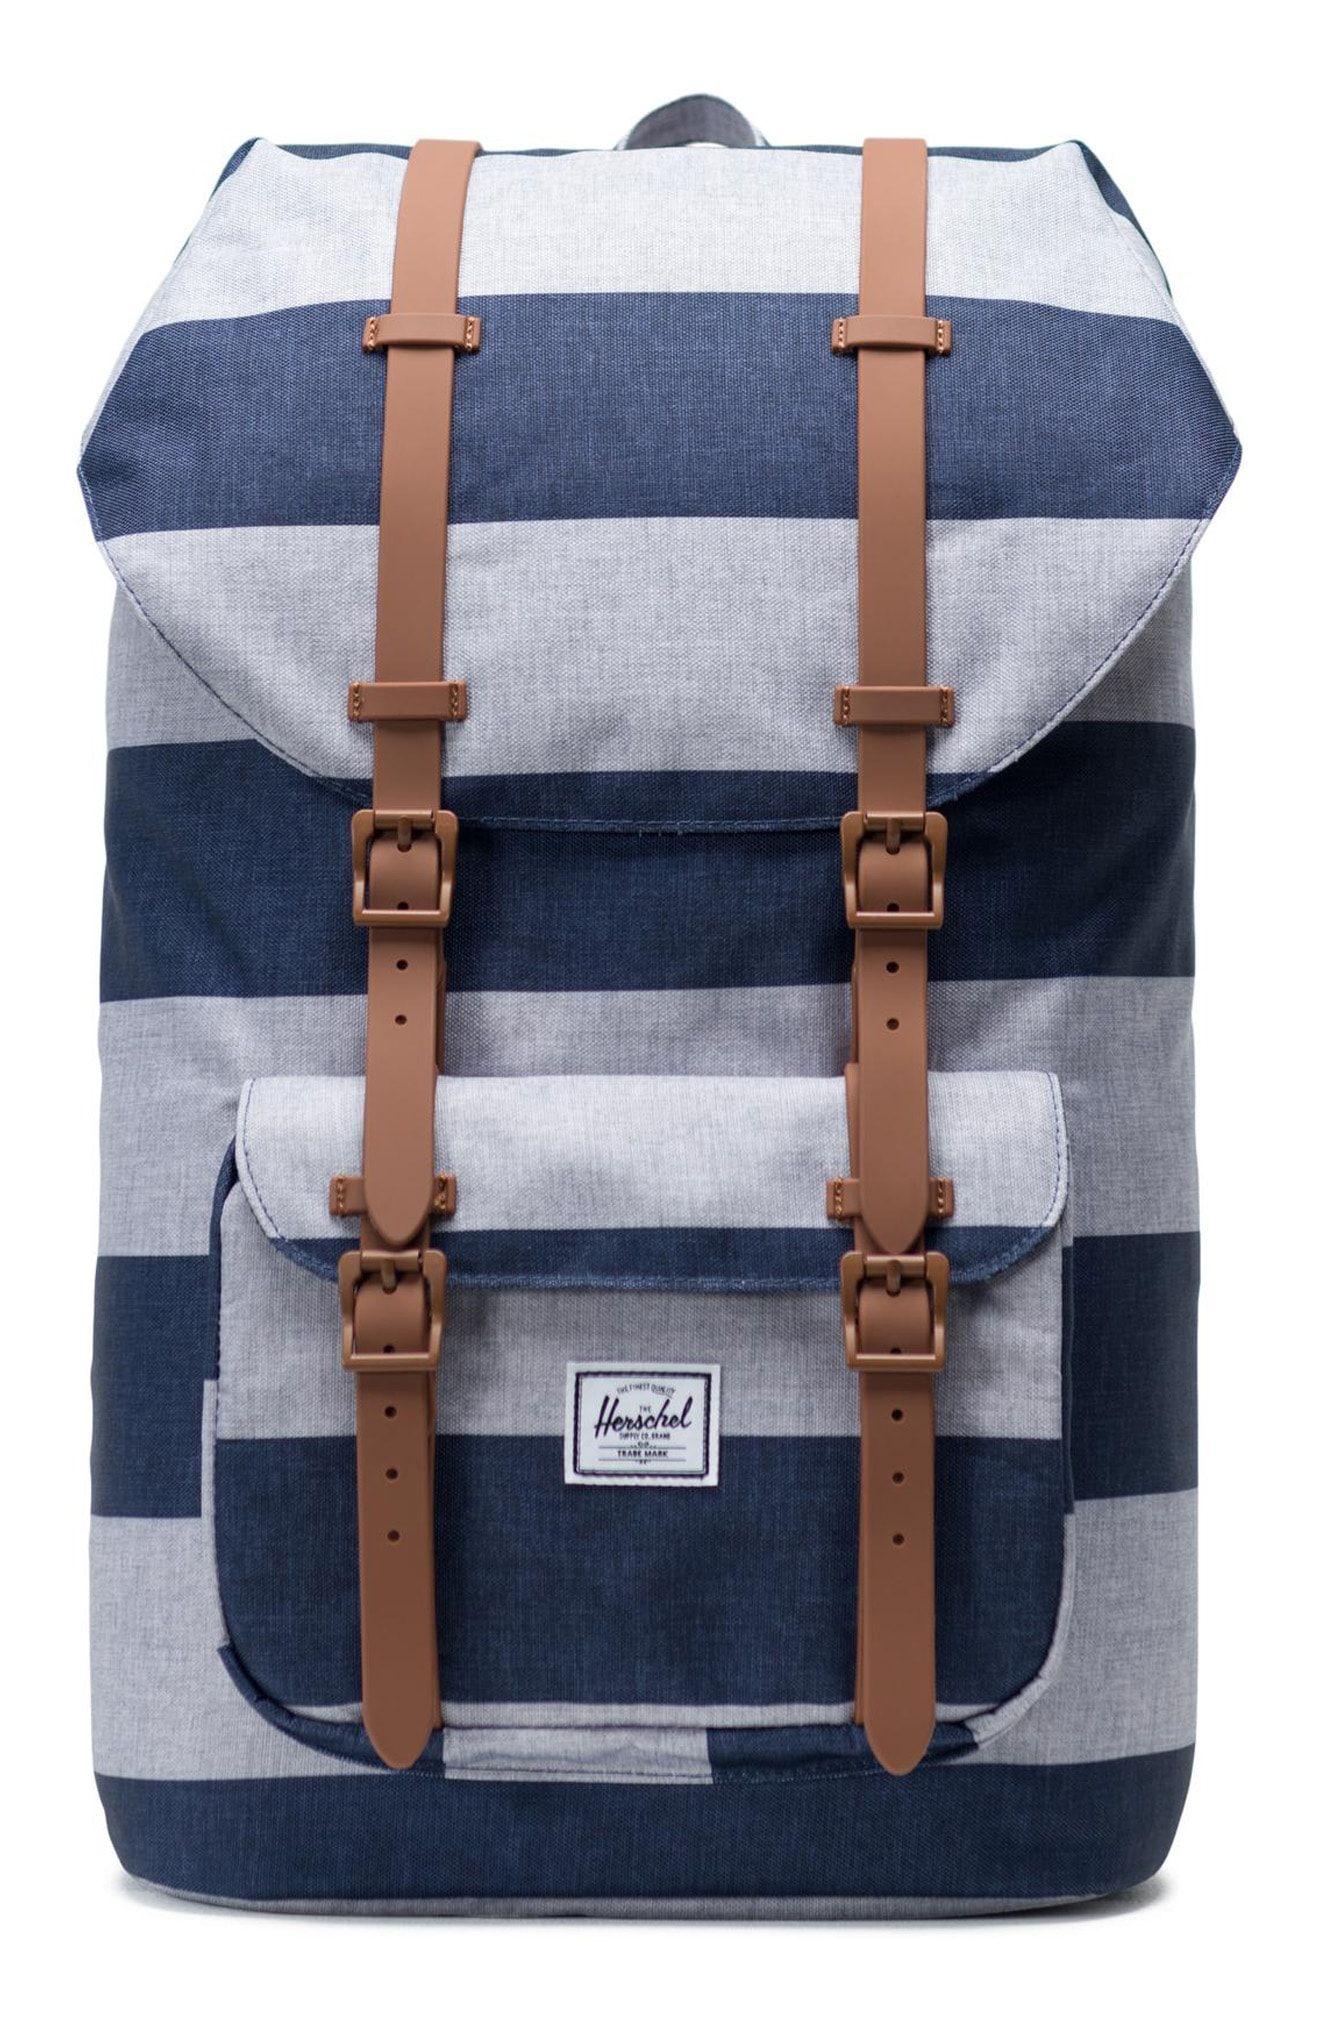 9b05ccca1f5 HERSCHEL SUPPLY CO. LITTLE AMERICA BACKPACK - BLUE.  herschelsupplyco.   bags  backpacks